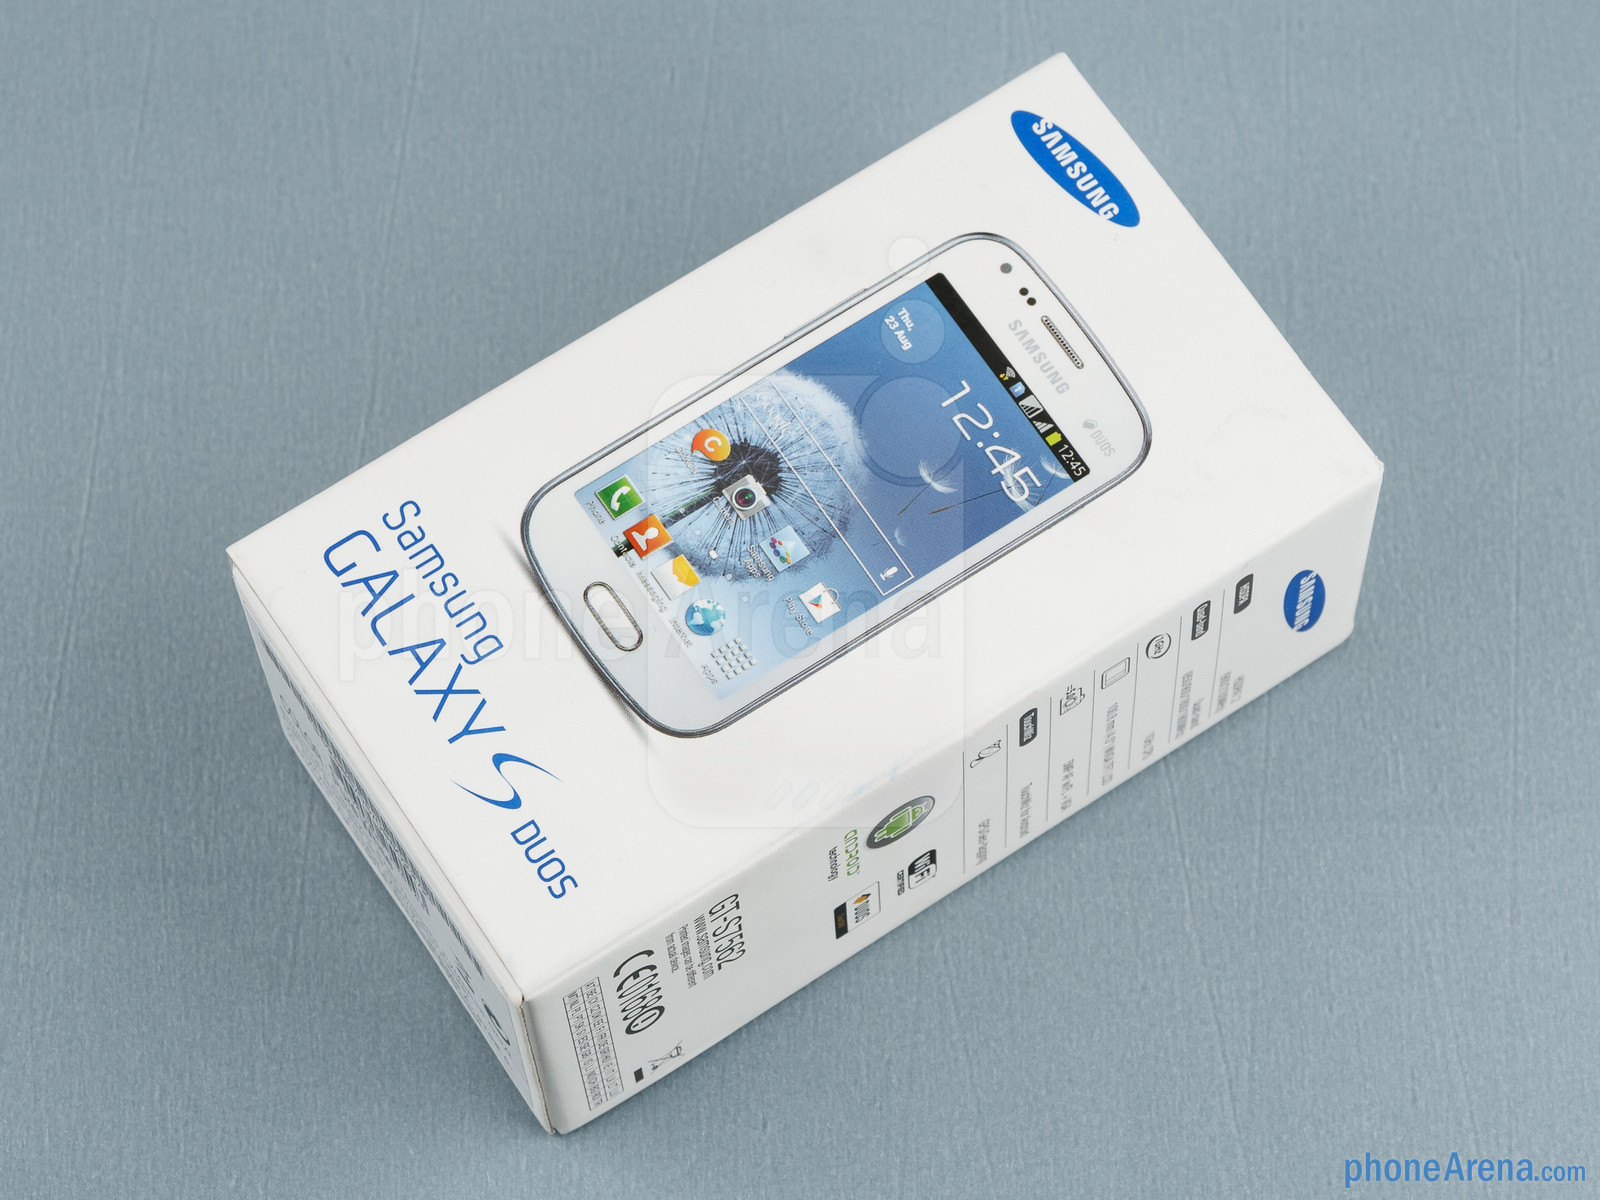 Samsung Galaxy S Duos S7562 Dual SIM Phone